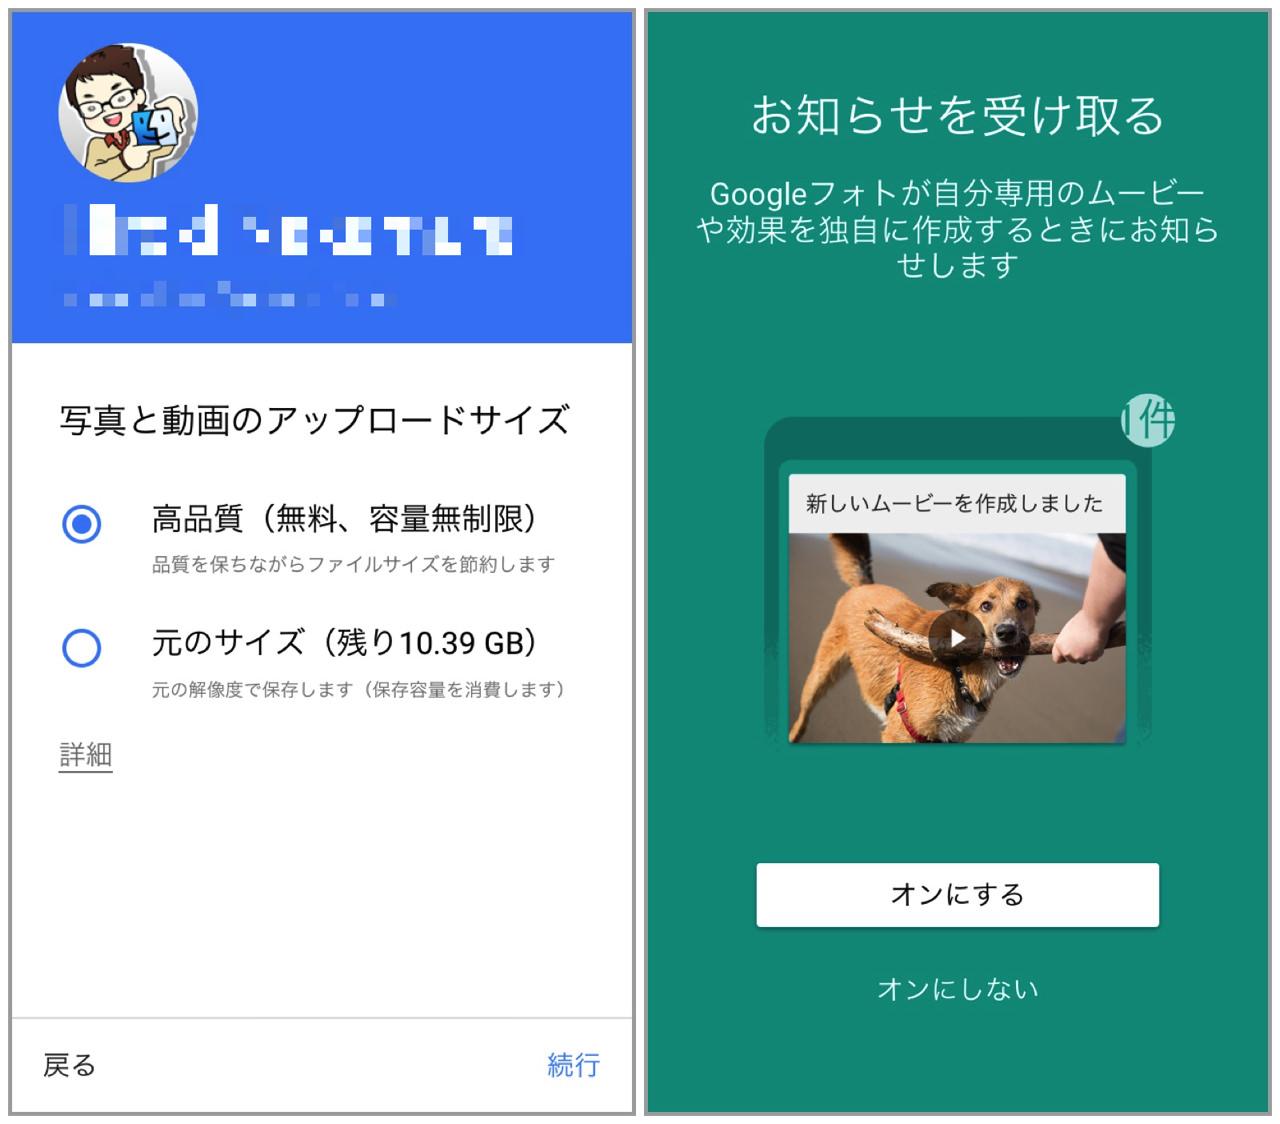 Google photo release2